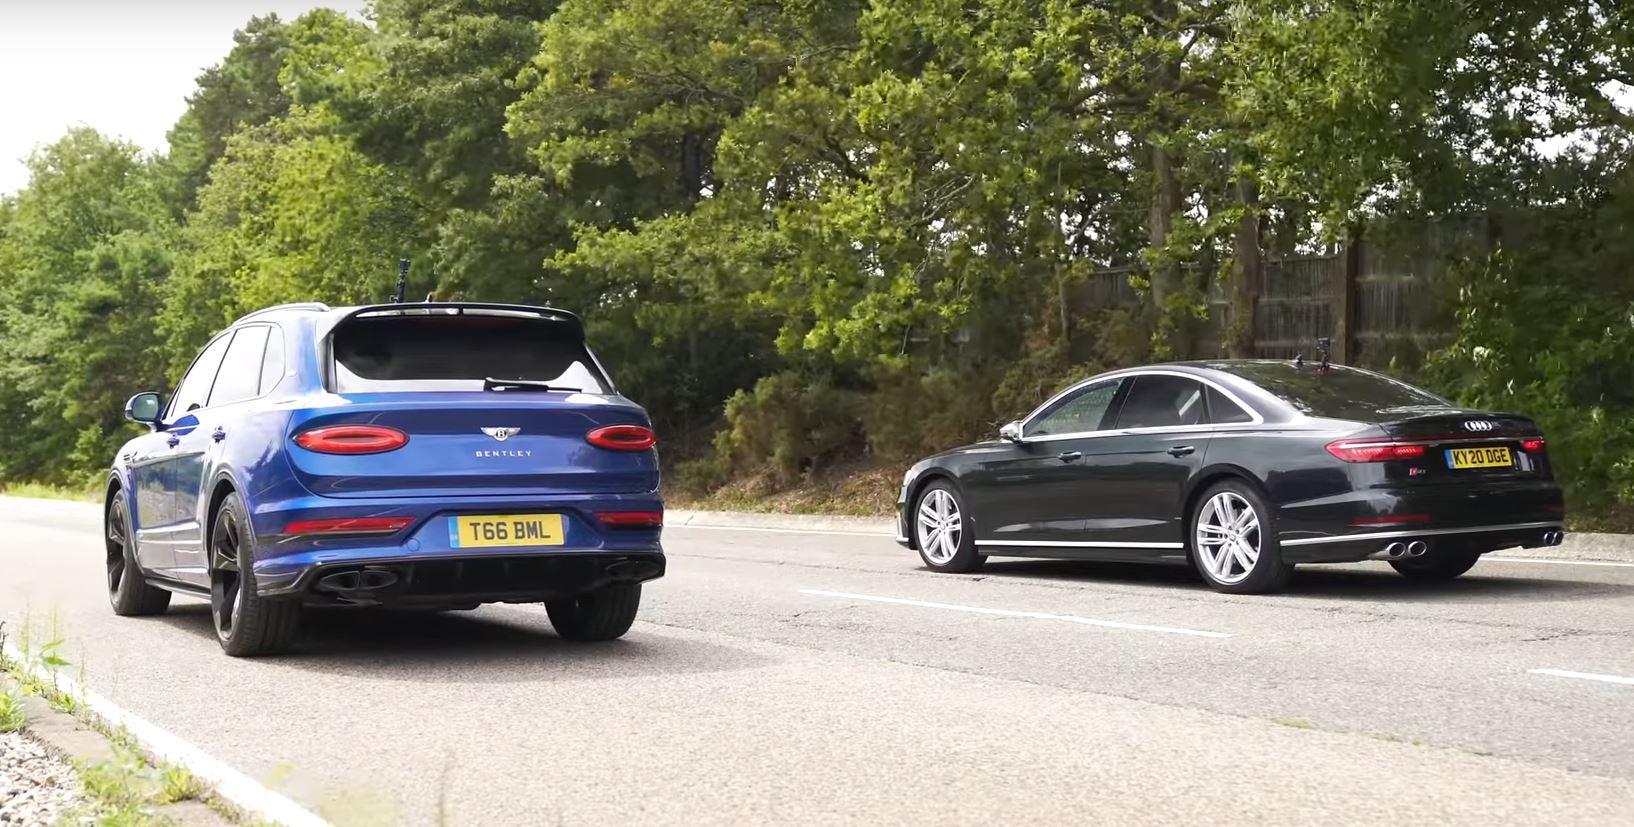 New Bentley Bentayga Drag Races Audi S8 Humiliation Follows Autoevolution